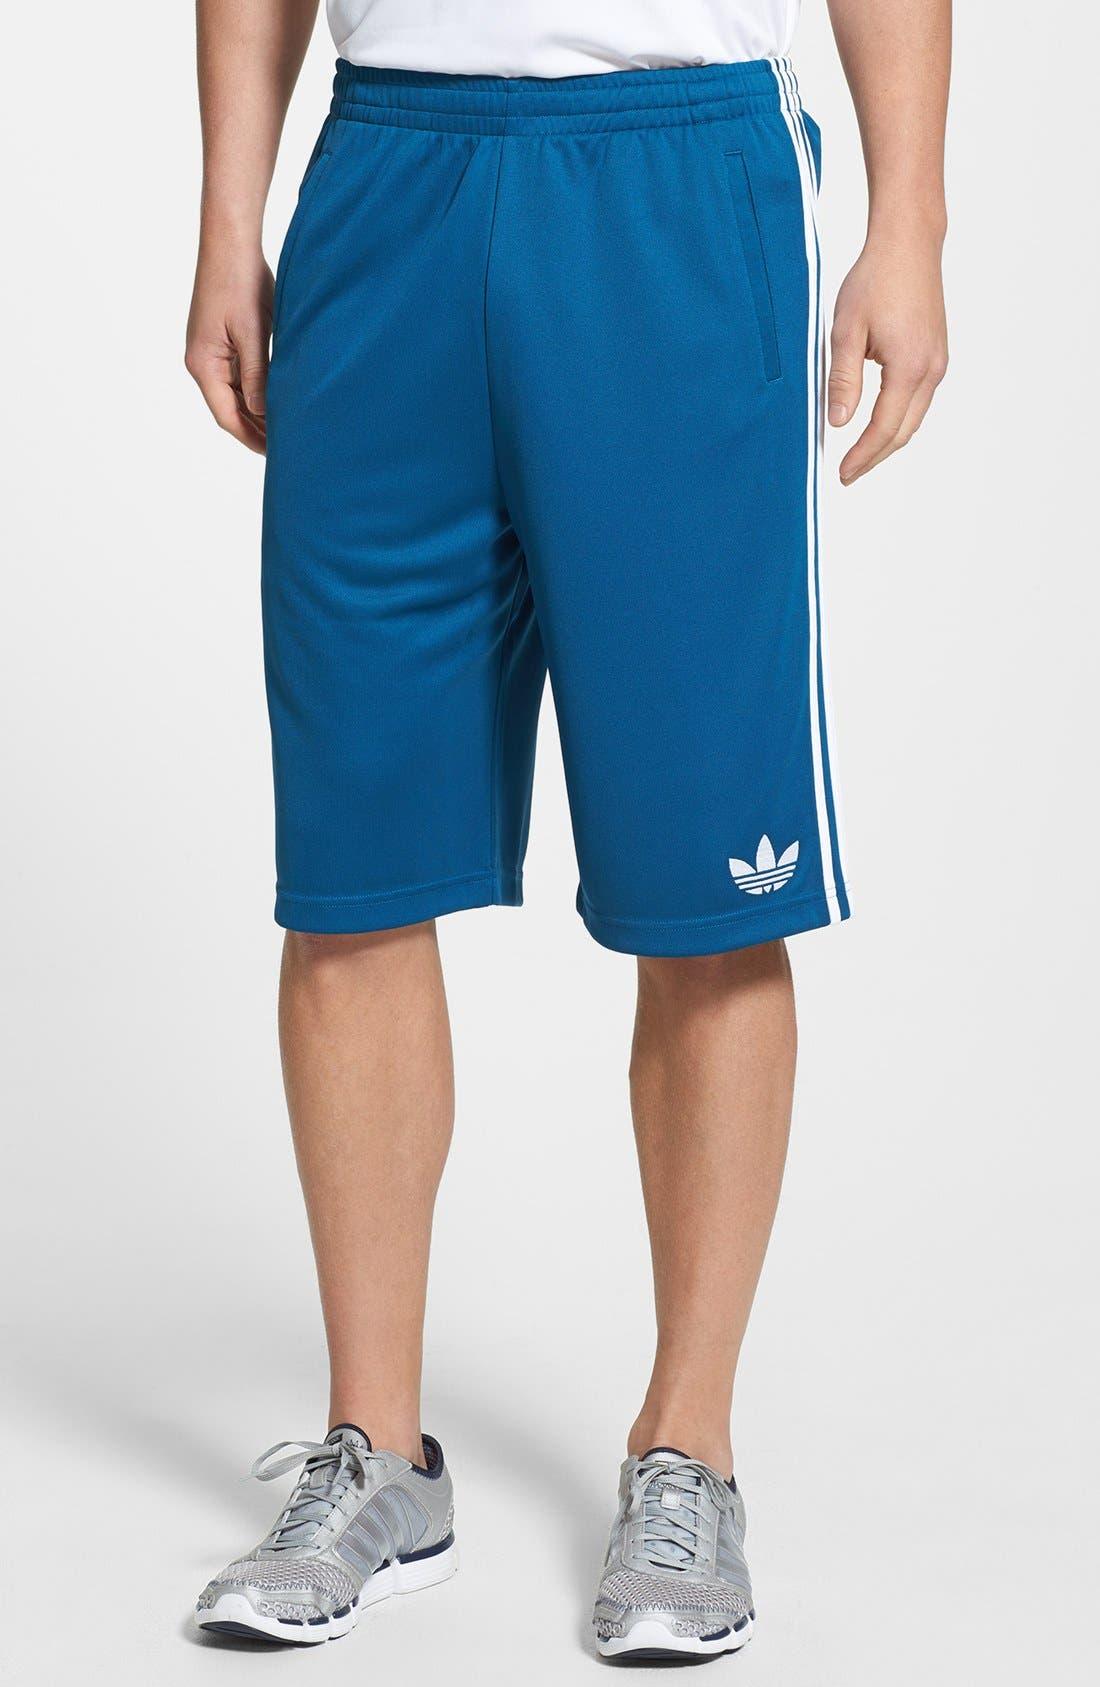 Alternate Image 1 Selected - adidas Originals 'Heritage' Shorts